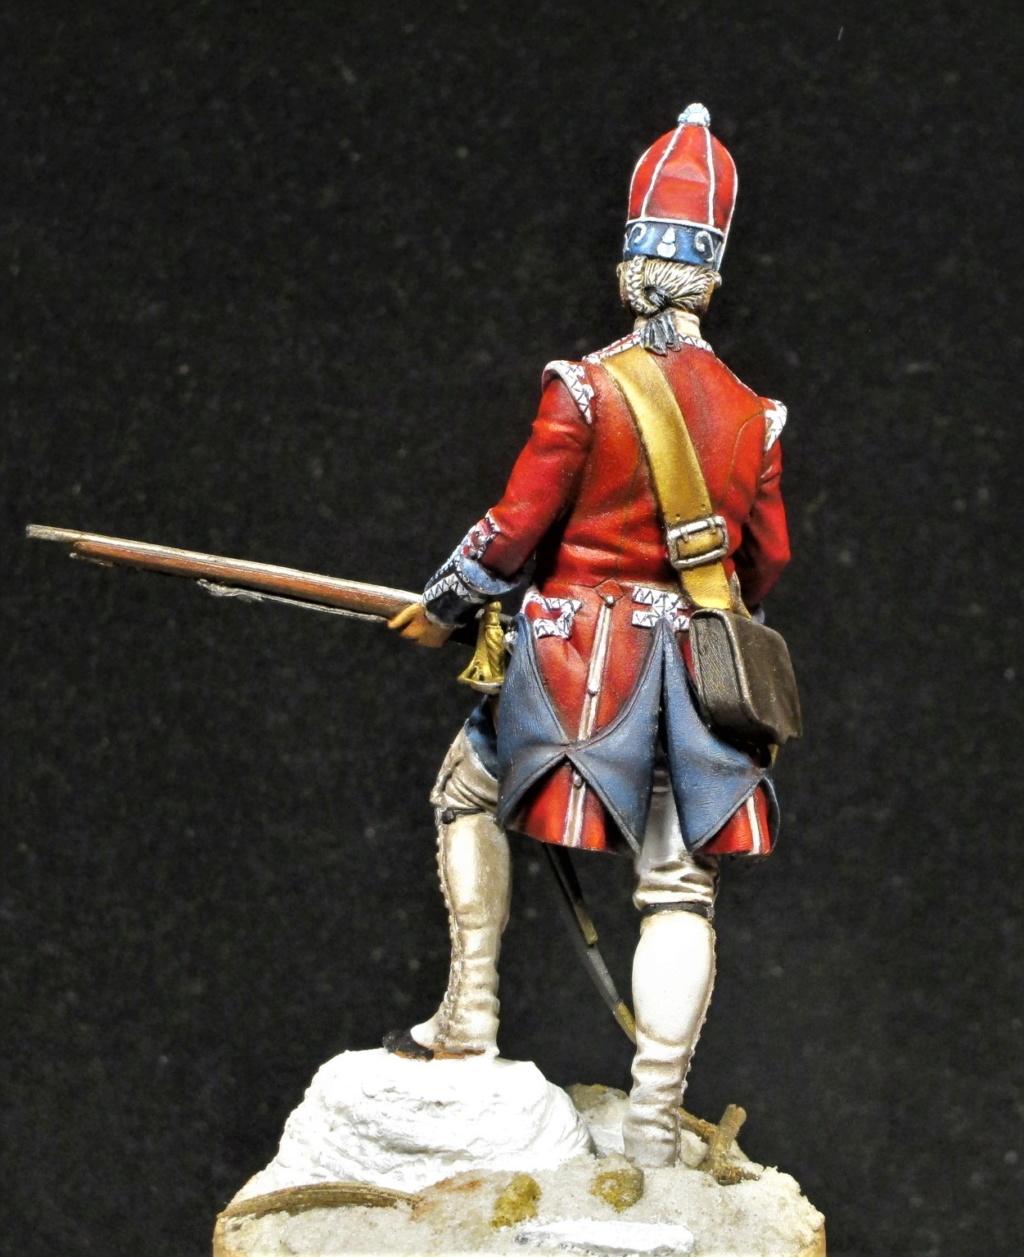 grenadier anglais du 18th Foot en 1751 Img_1212